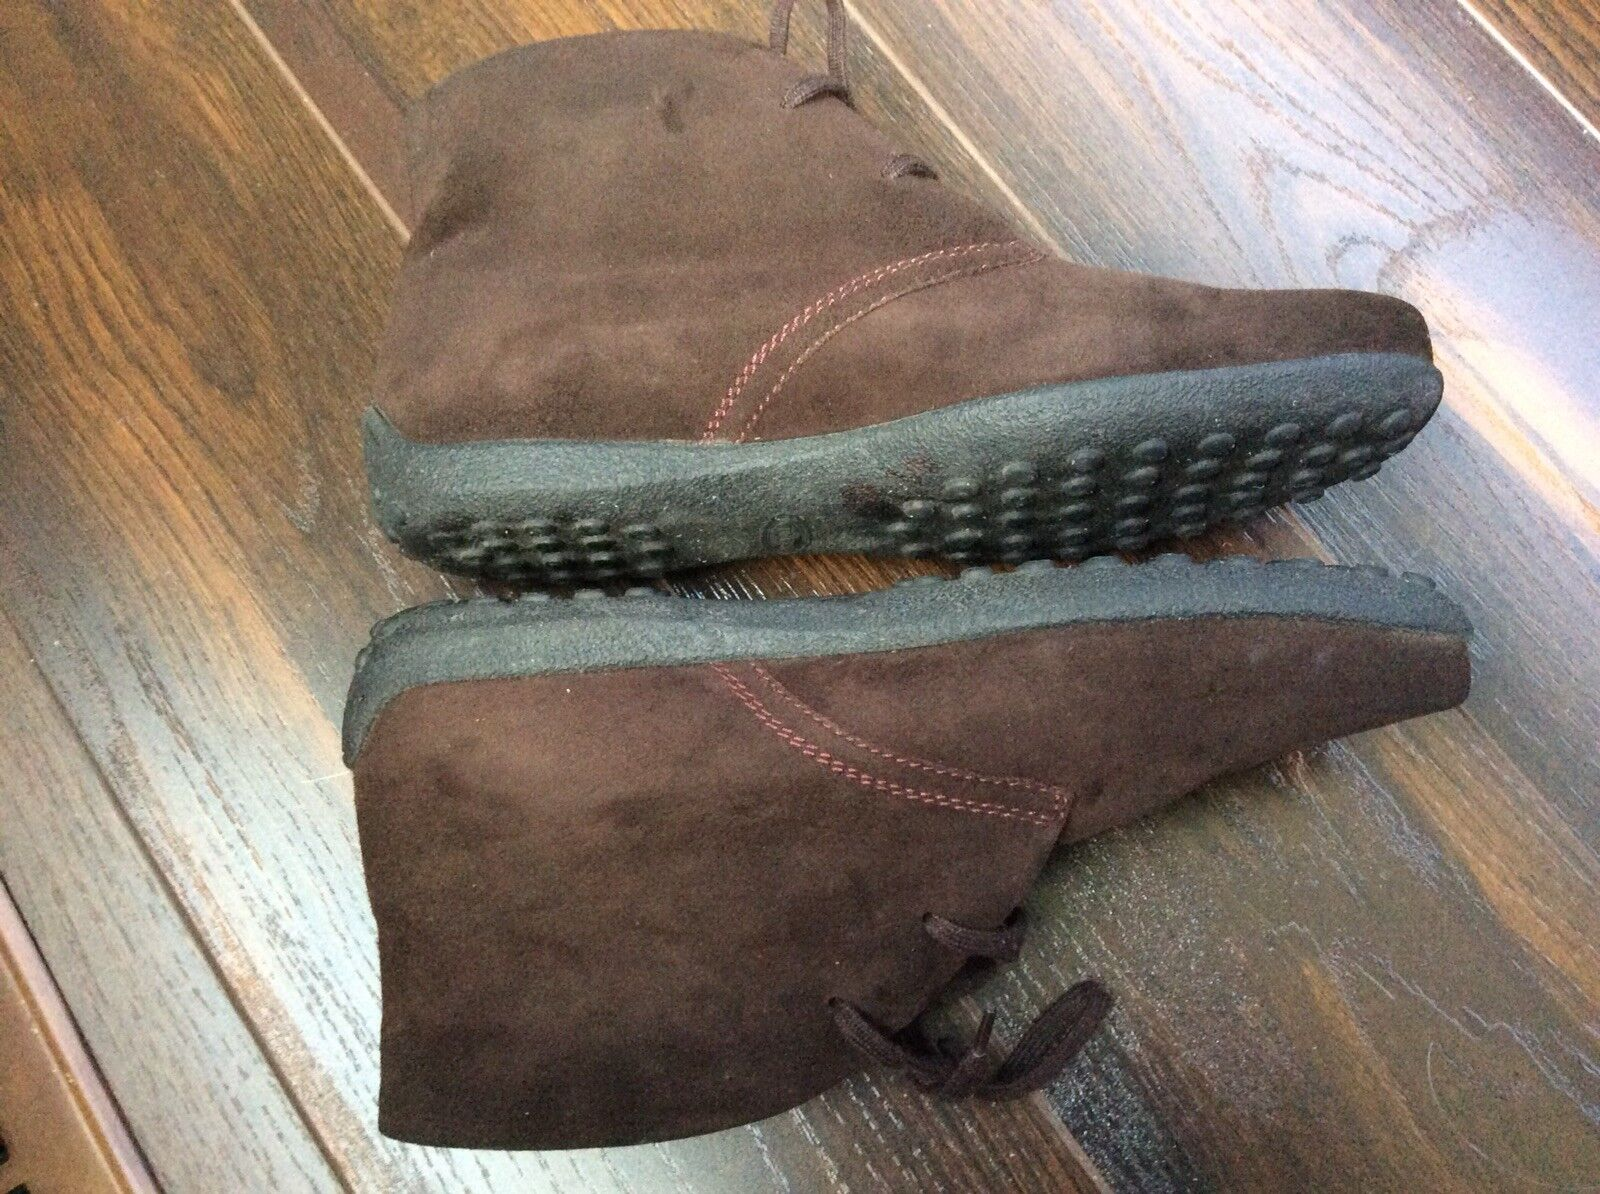 Tods Damenschuhe Braun Braun Braun Suede Leder Driving Ankle Stiefel SIZE 6.5 Made In  07de90